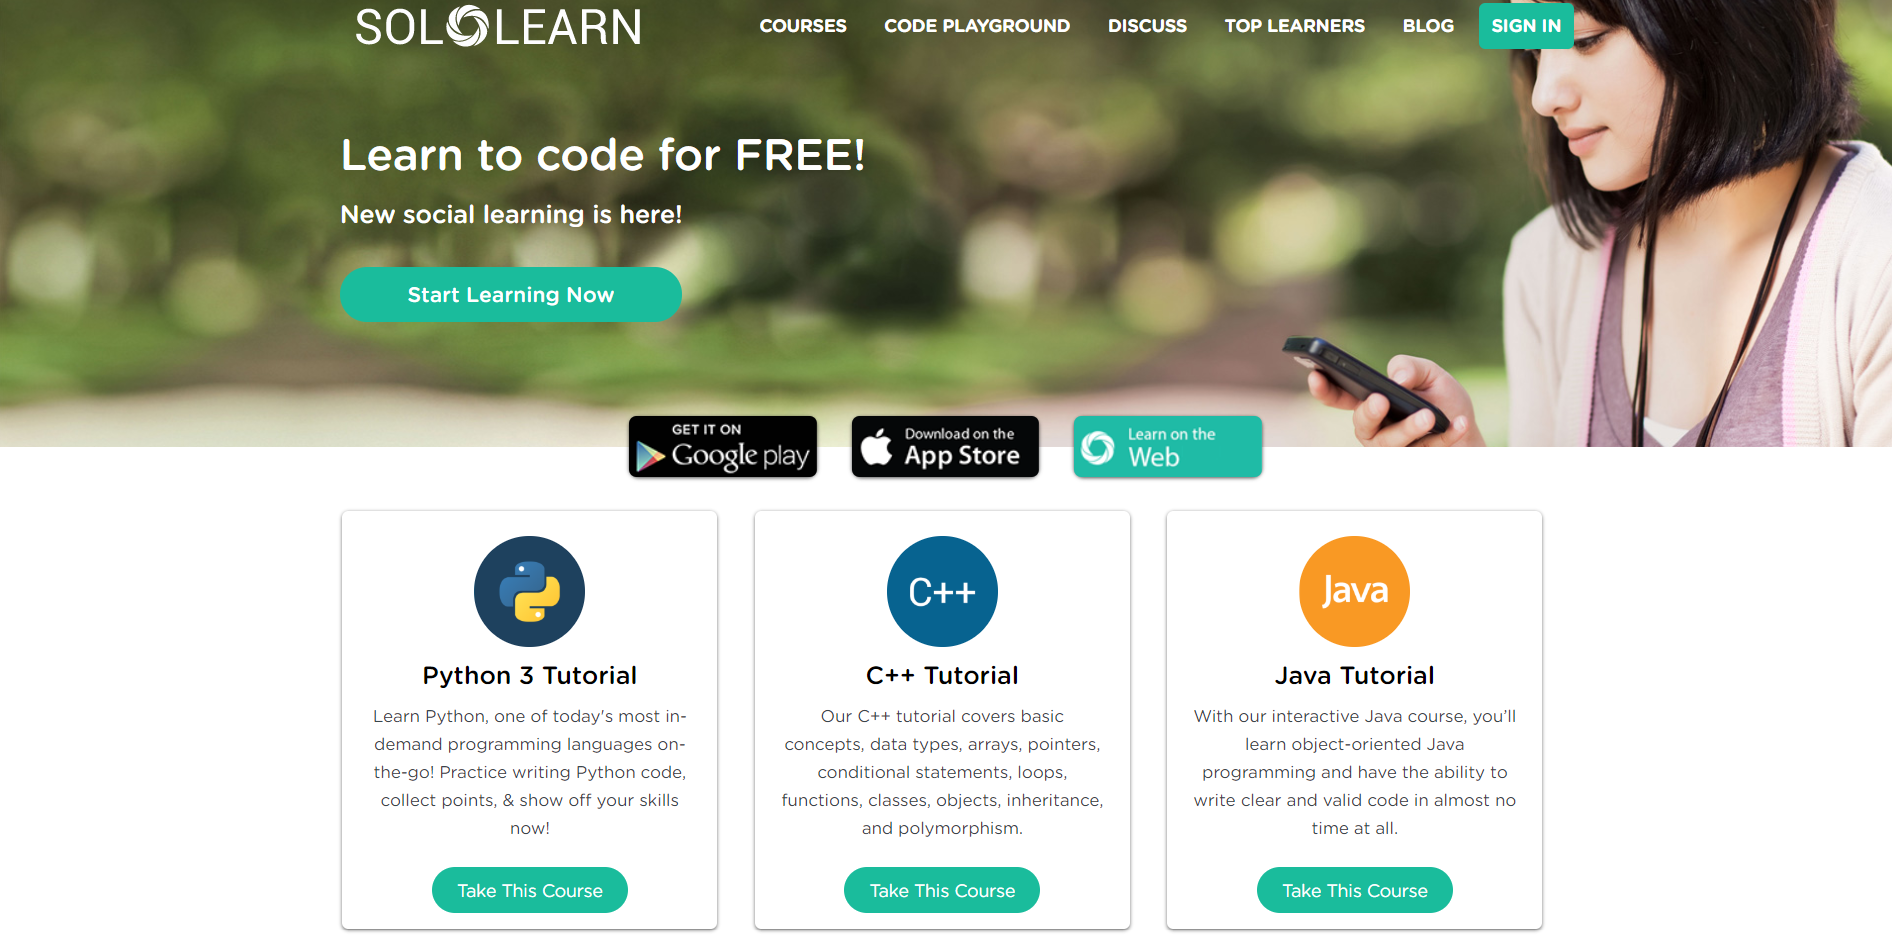 solo learn site